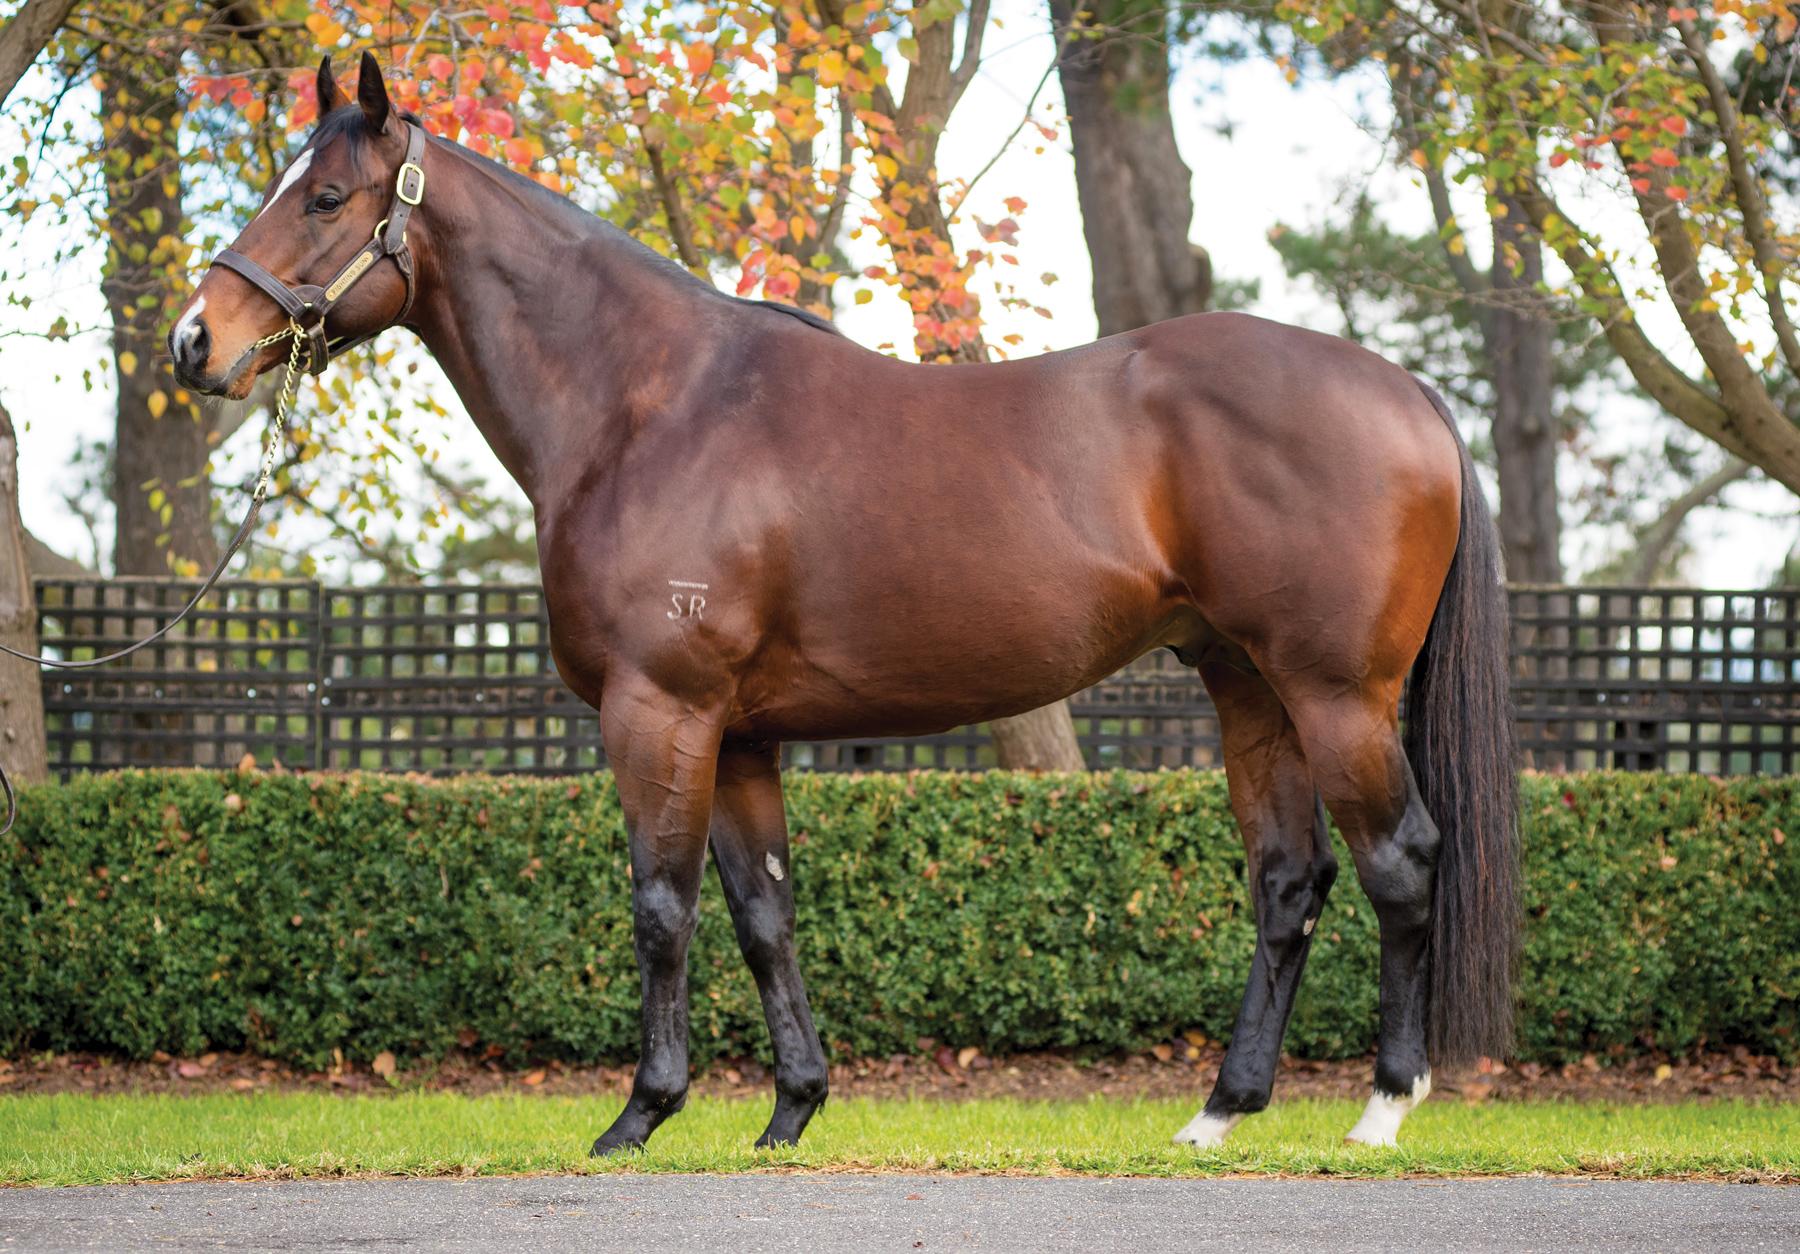 https://www.stallions.com.au/wp-content/uploads/2019/10/FIGHTING-SUN_2017-WEB.jpg